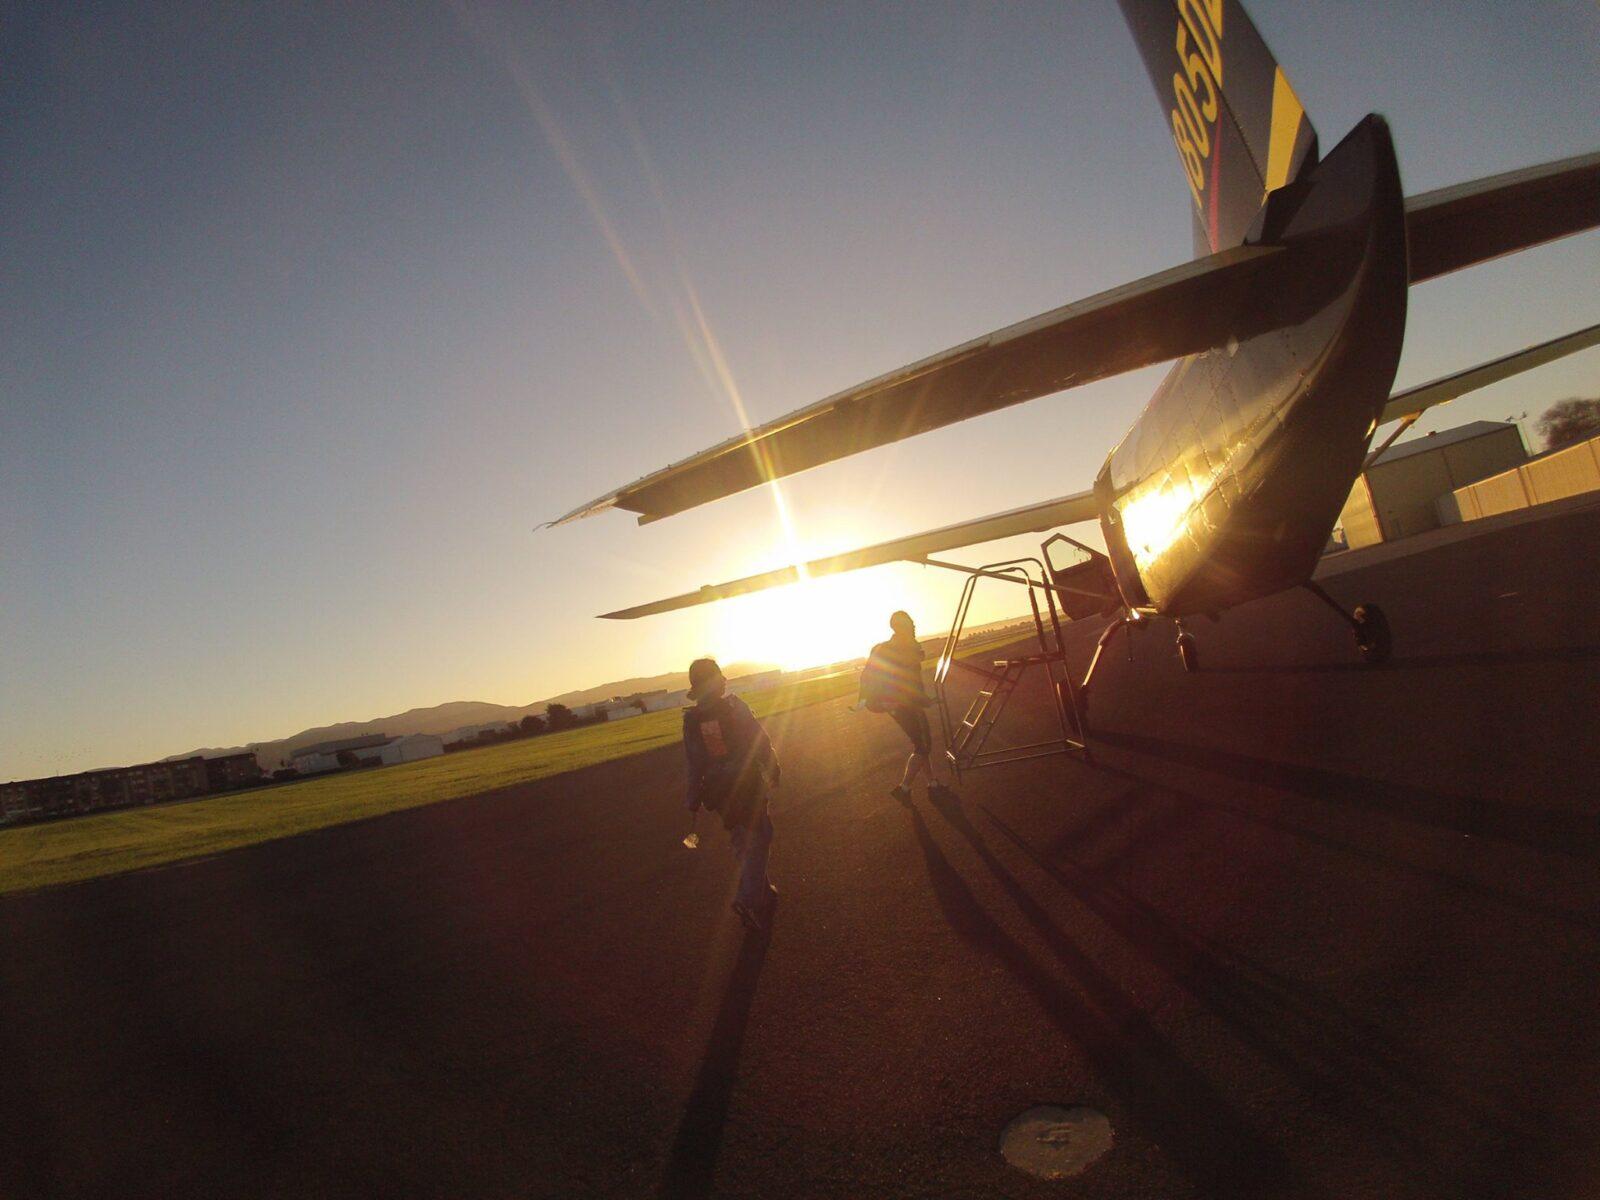 sunset skydive with Skydive Santa Barbara